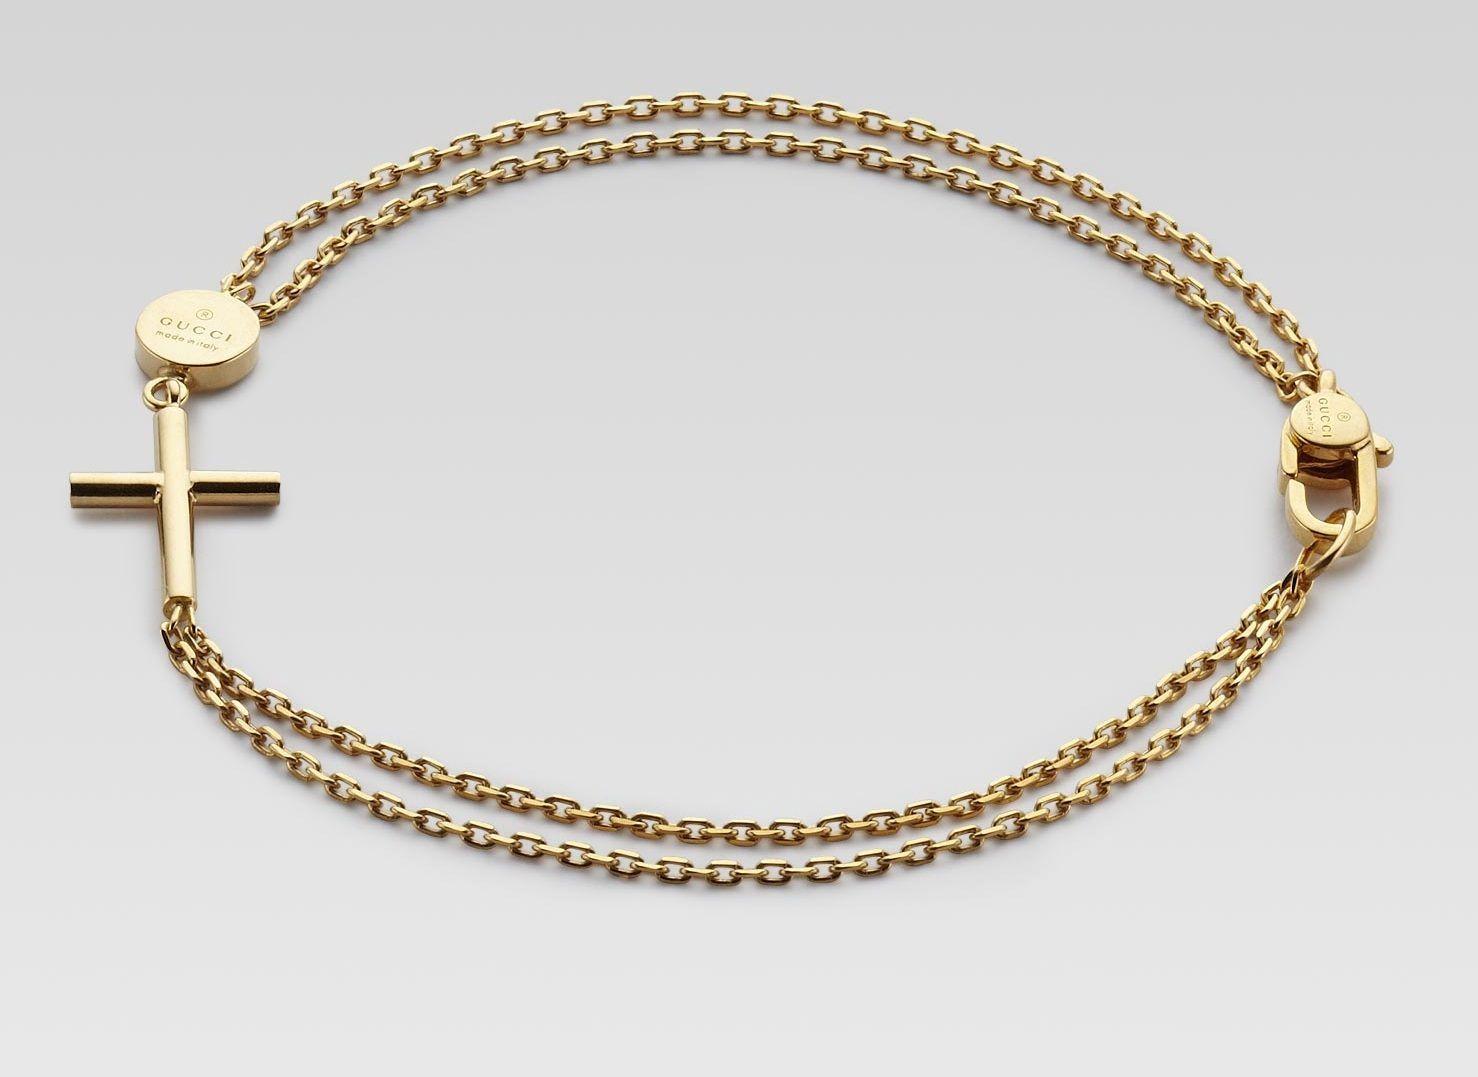 Gucci menus gold bracelet with cross pendant gold jewellery